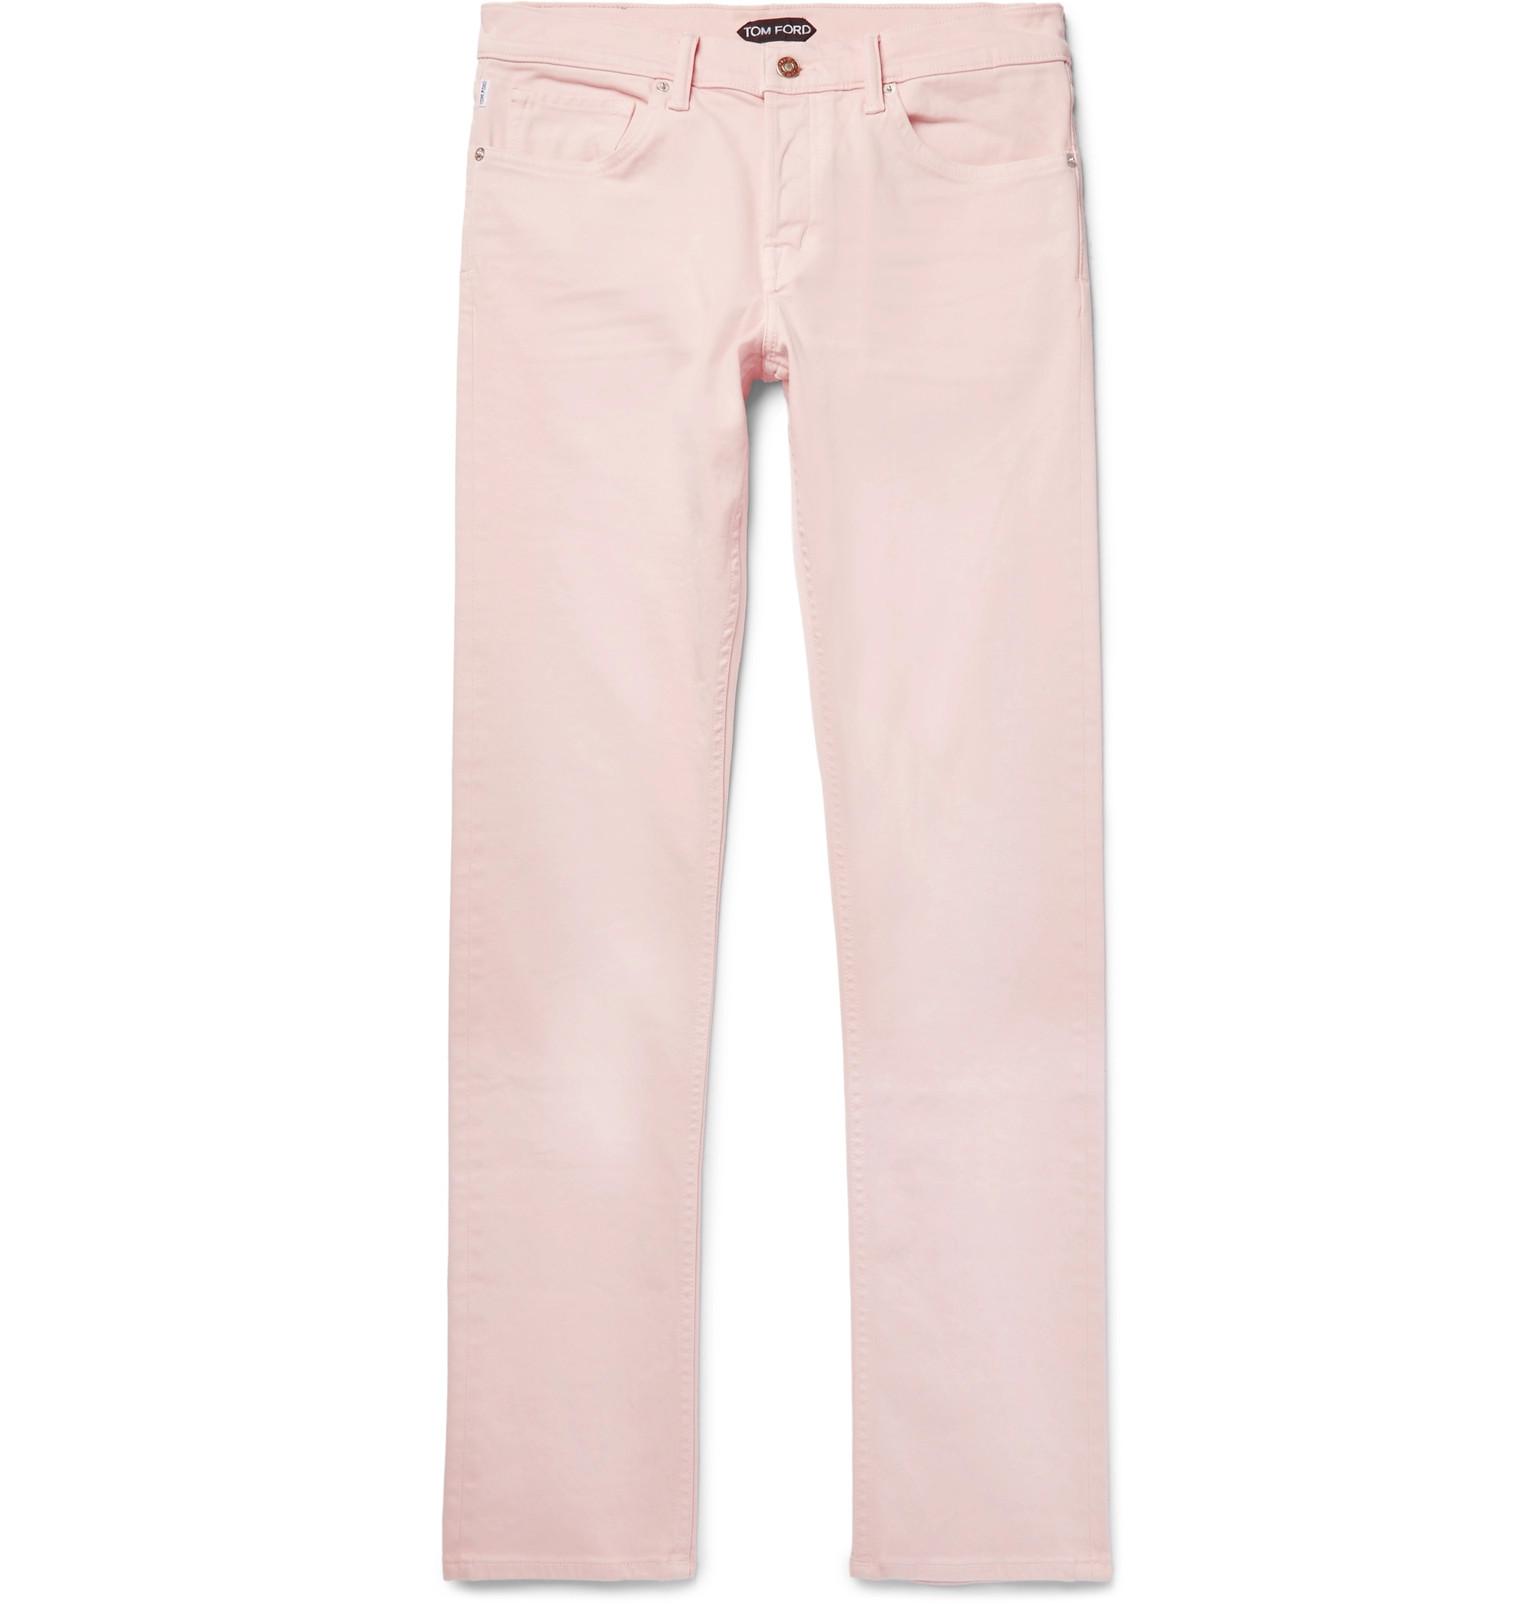 Slim-fit Washed Stretch-denim Jeans Tom Ford DlVqnwsVY